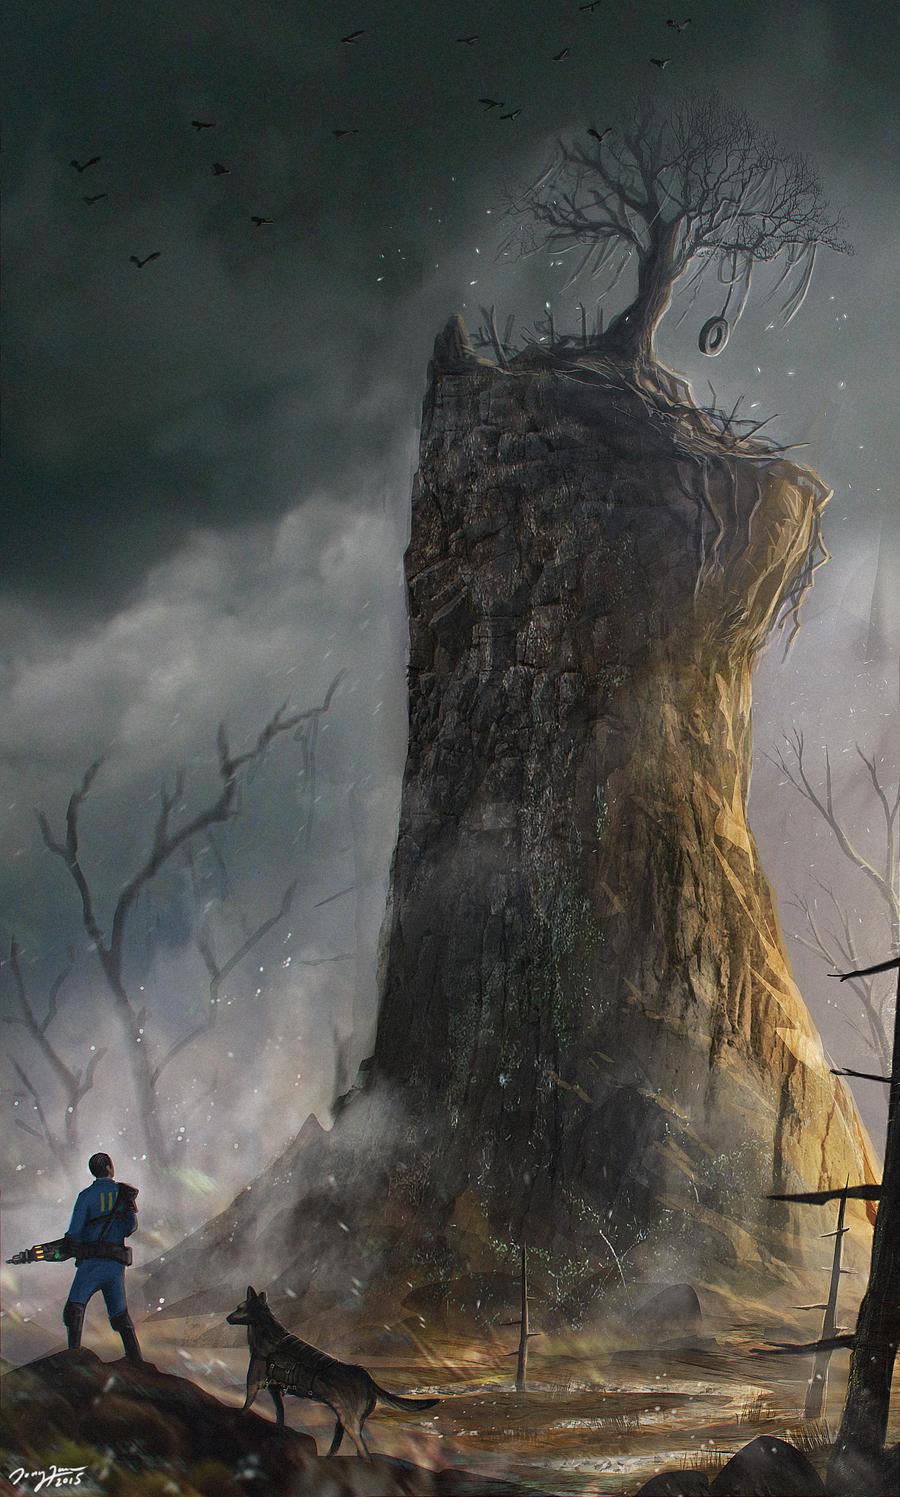 Drakengard 3 Four Follower and Armor by user619 on DeviantArt